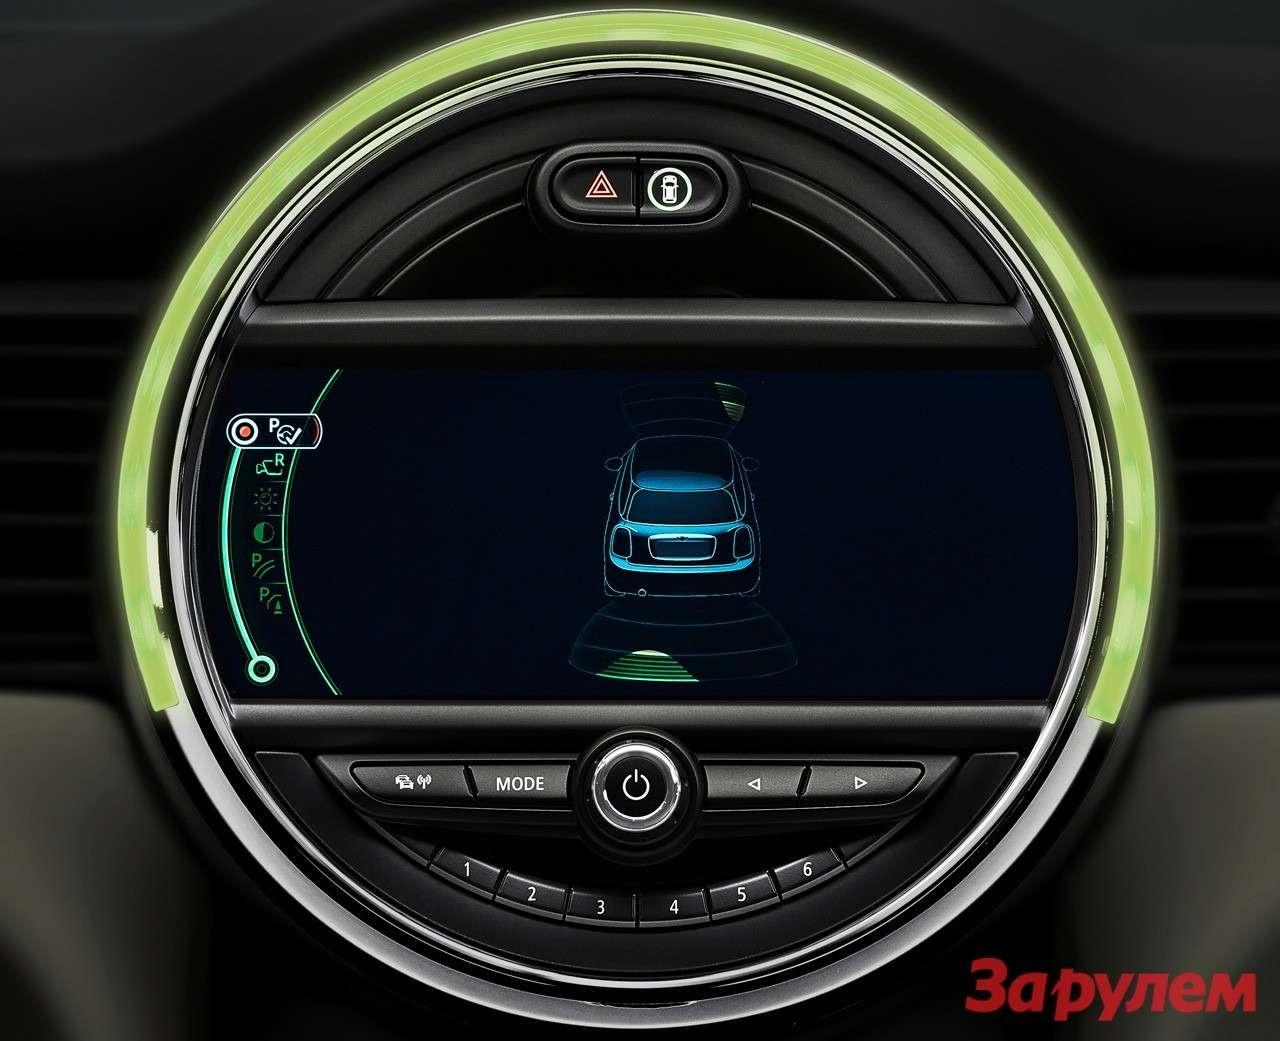 003mini driver assist technology 1